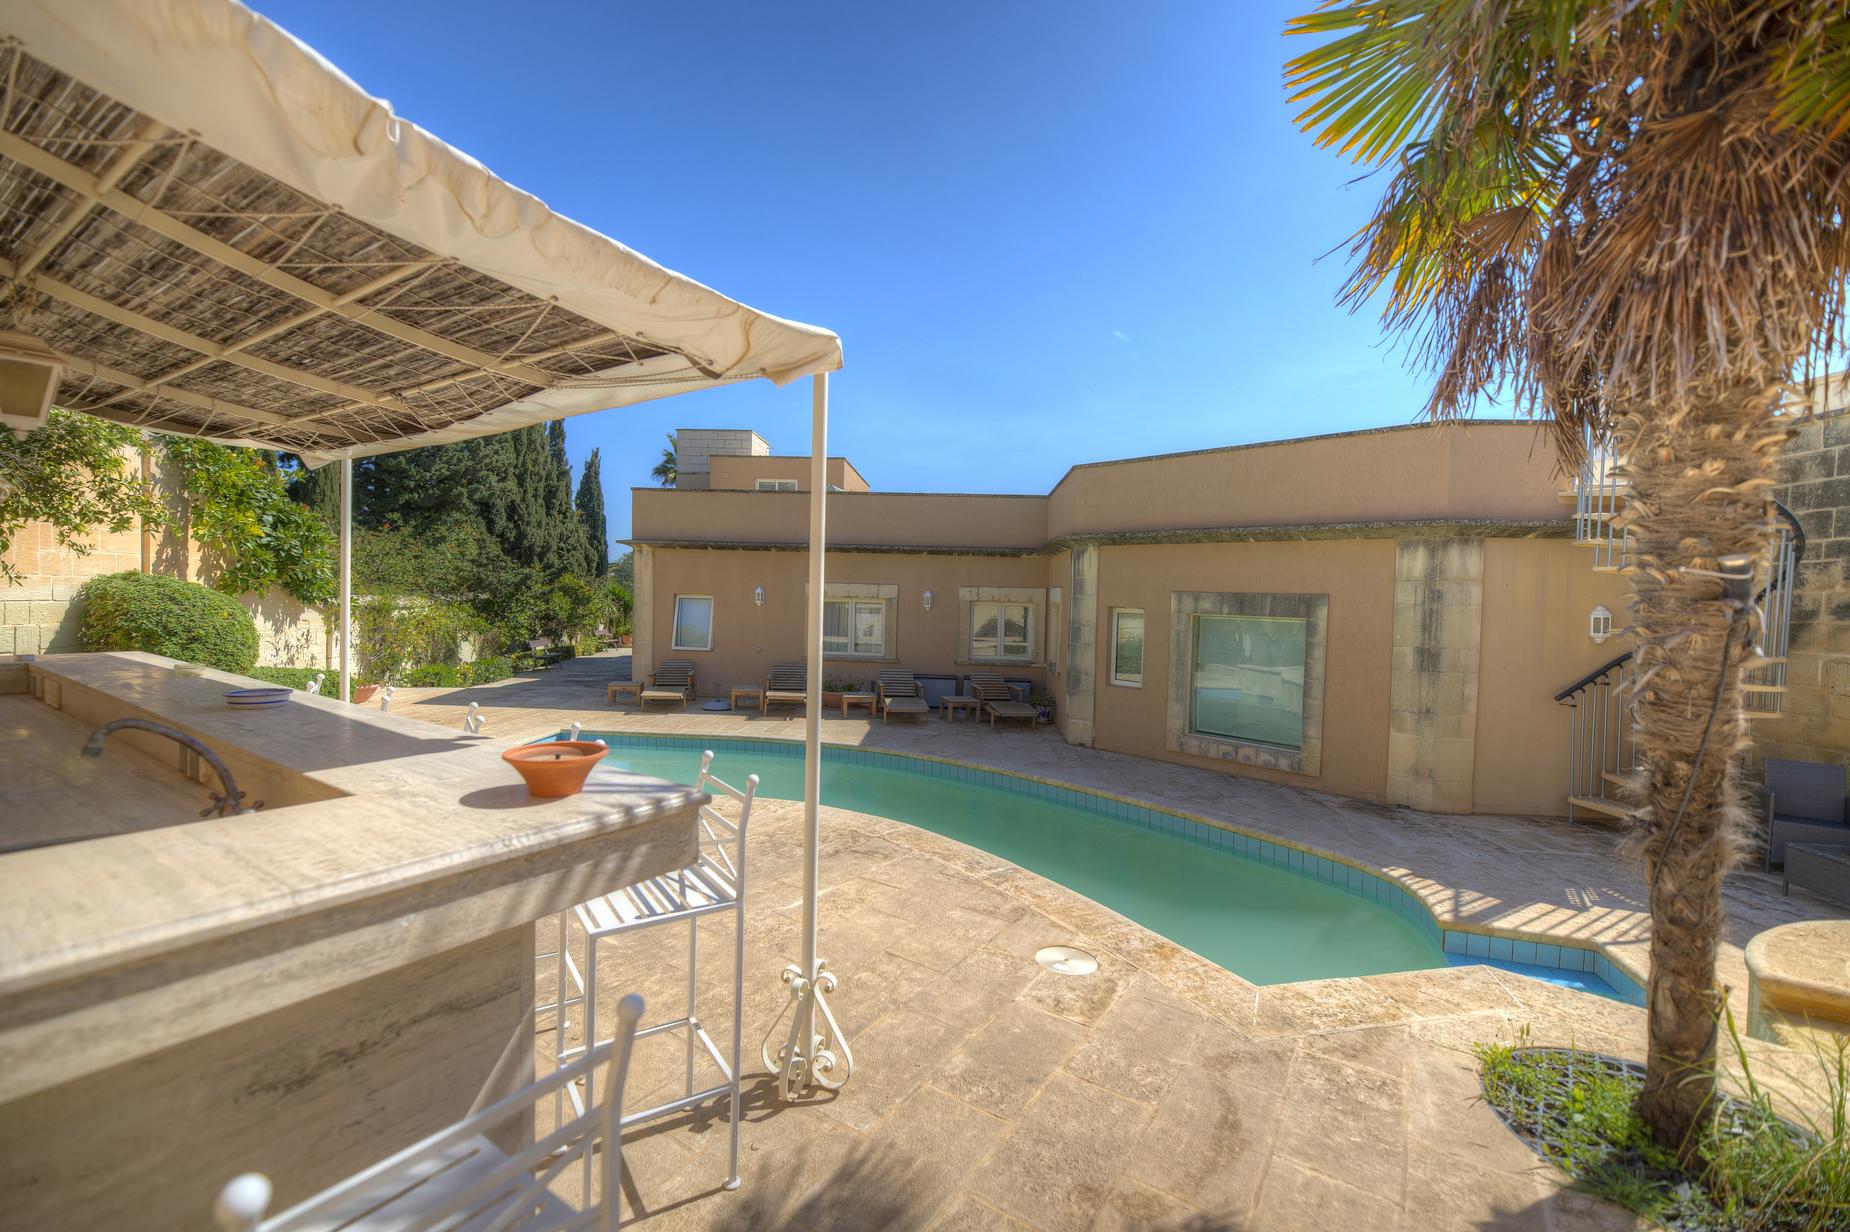 4 bed Villa For Rent in Iklin, Iklin - thumb 17